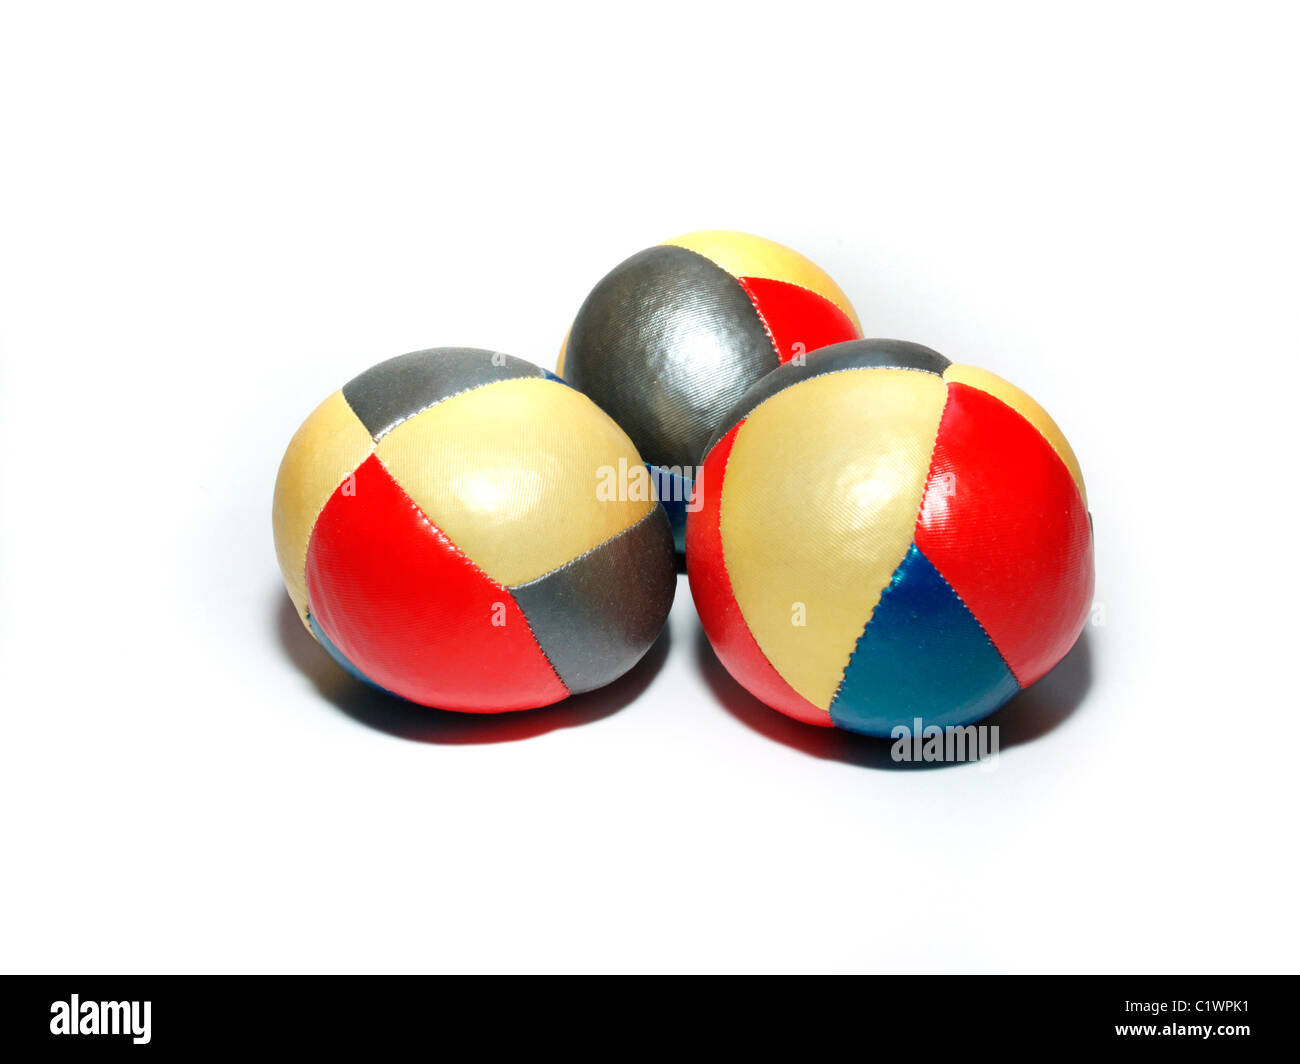 Juggling balls on white background - Stock Image